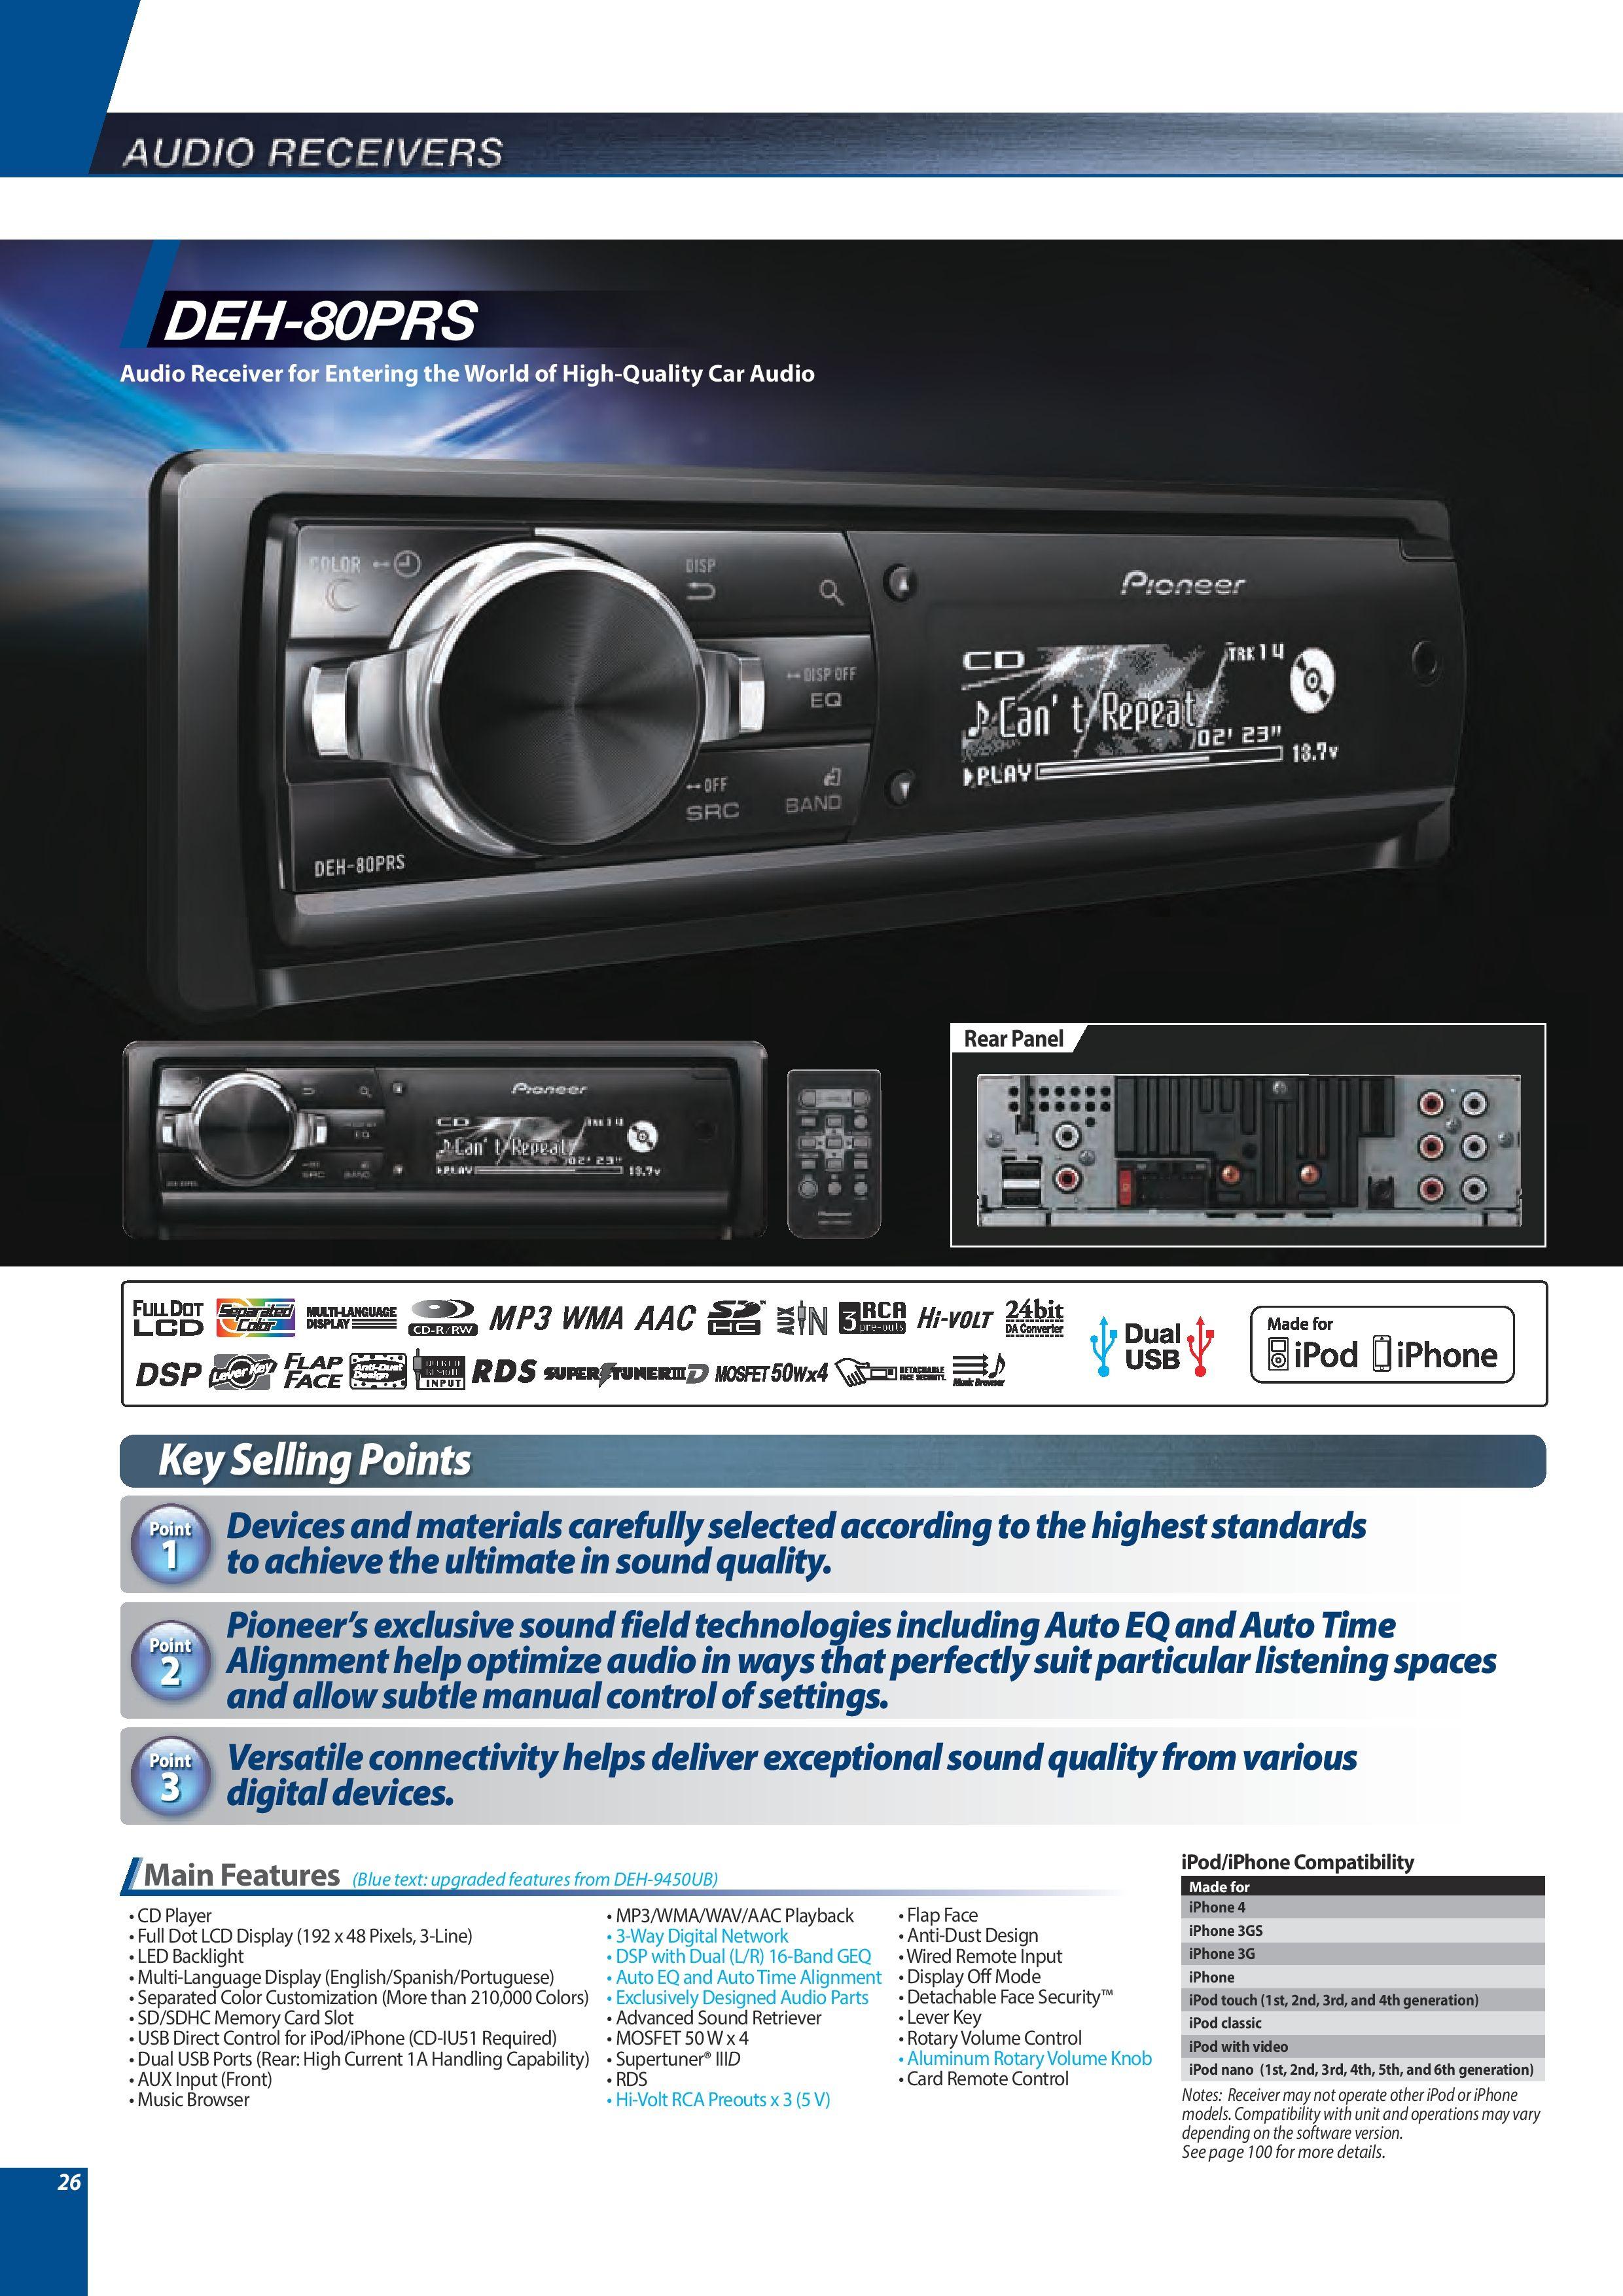 pioneer deh 80prs car stereo teknoloji pinterest rh pinterest com Pioneer Deh 1100 Wiring-Diagram Pioneer Deh 11 Wiring Diagram